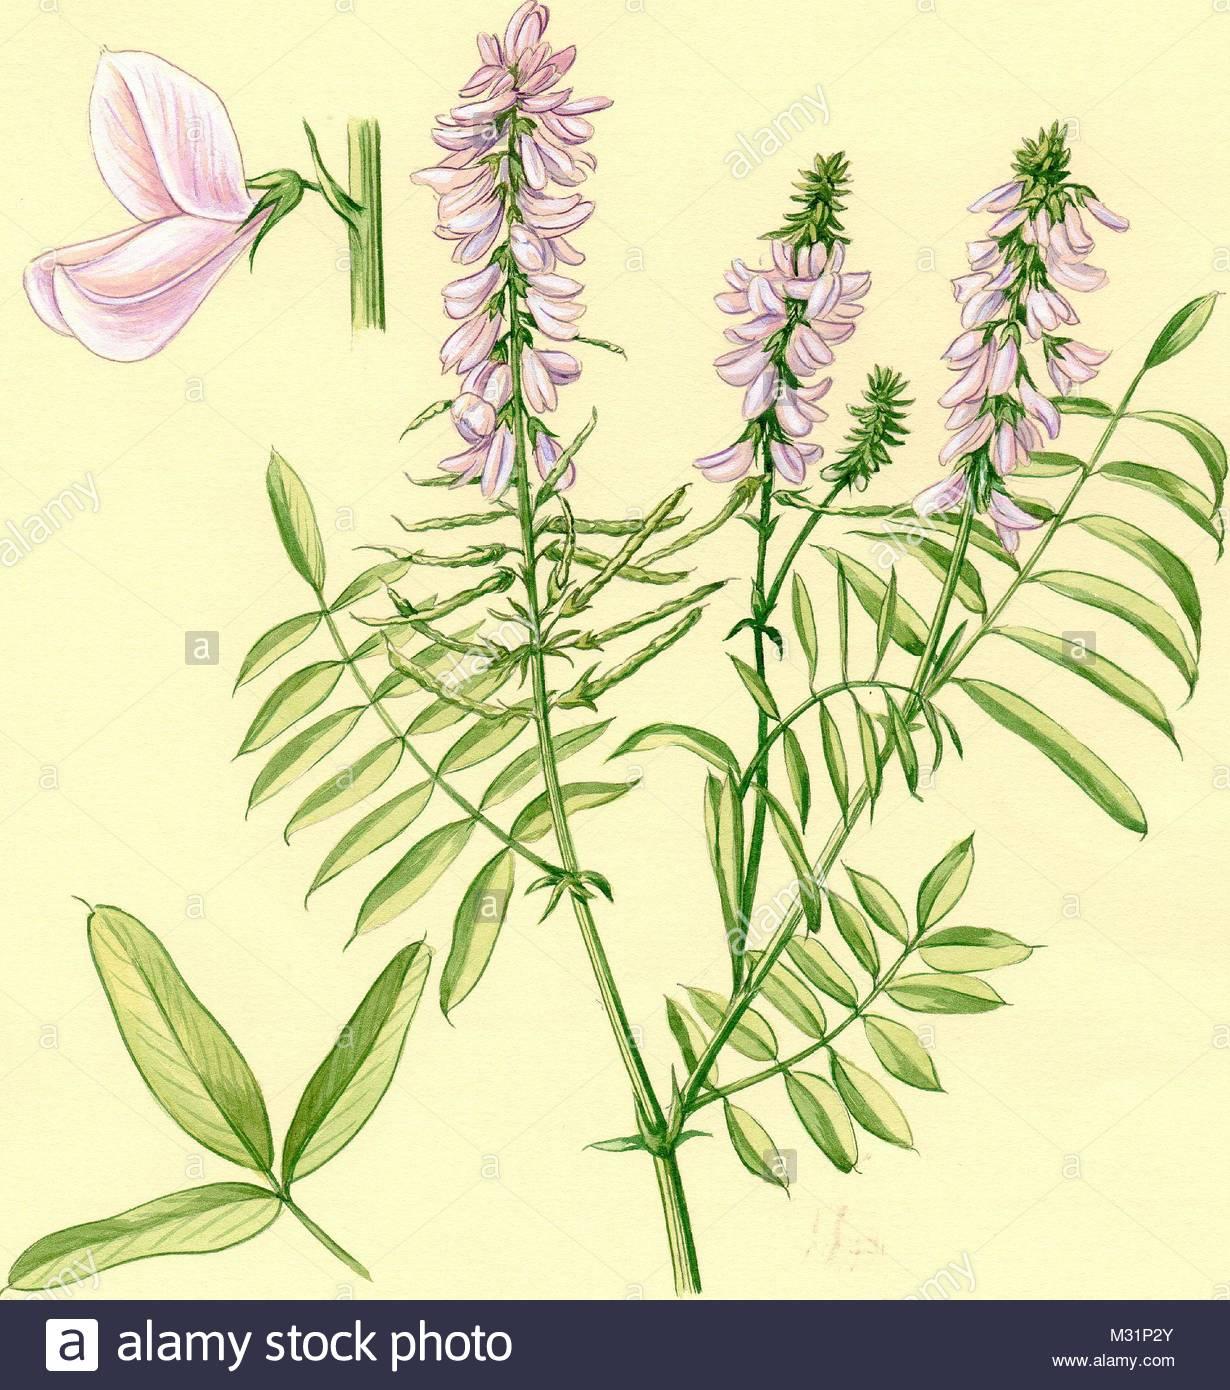 medicinal herbs herbs geiraute galega officinalis - Stock Image